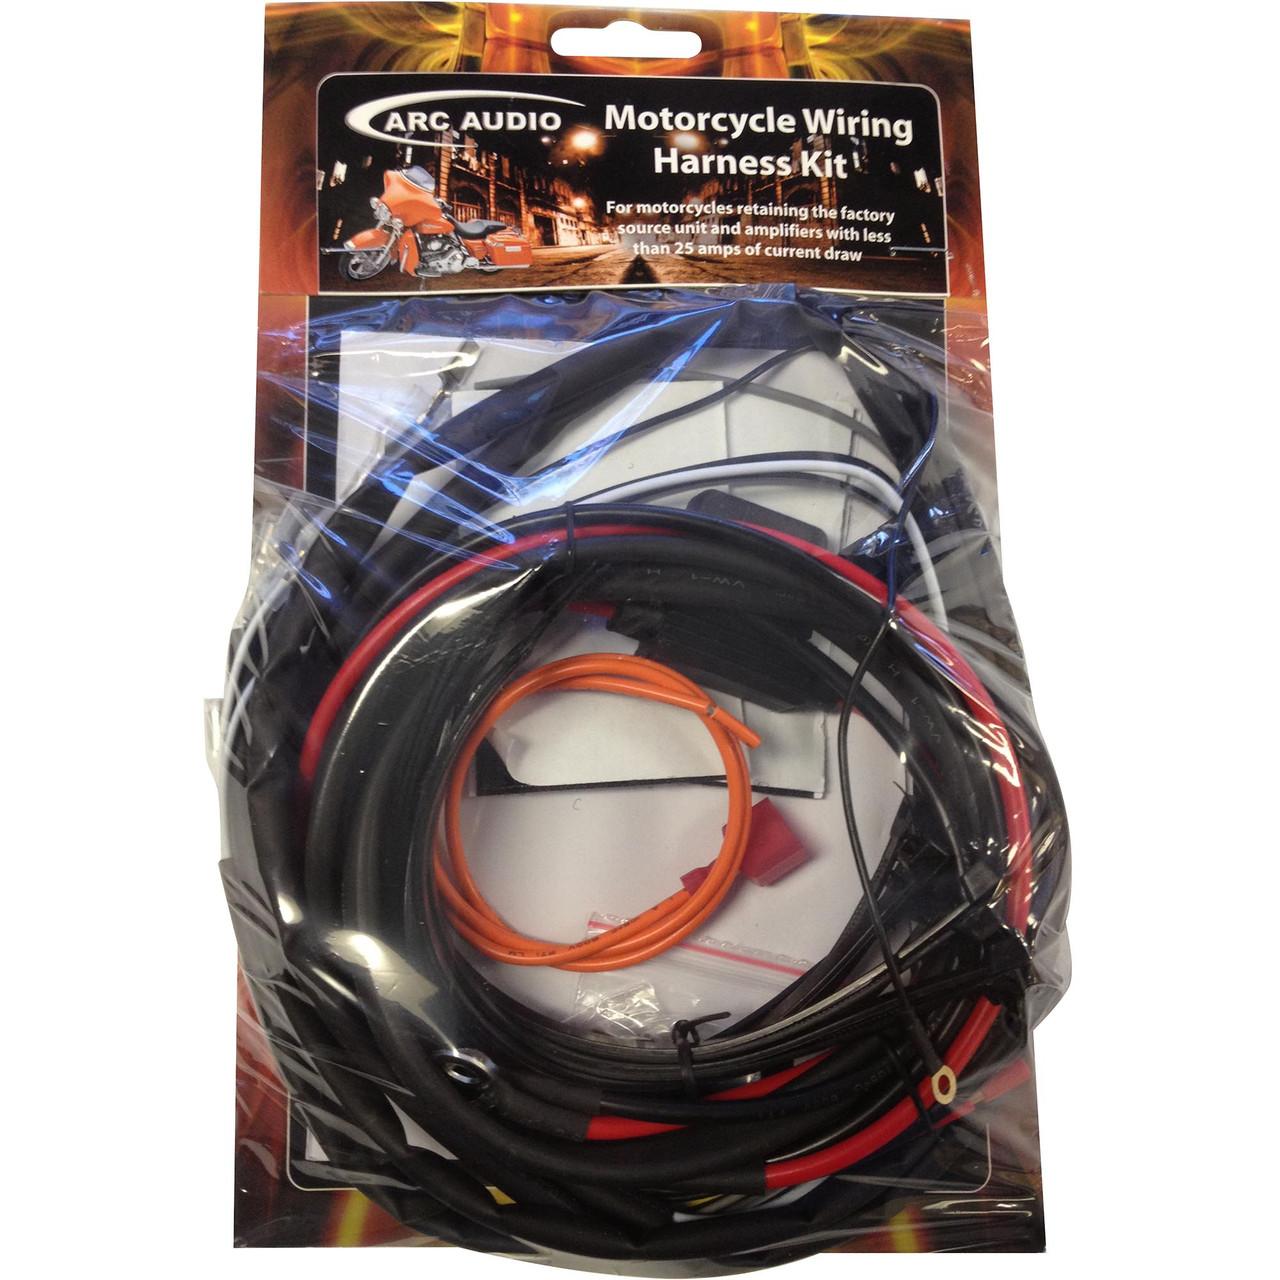 Harley Davidson Wiring Kits